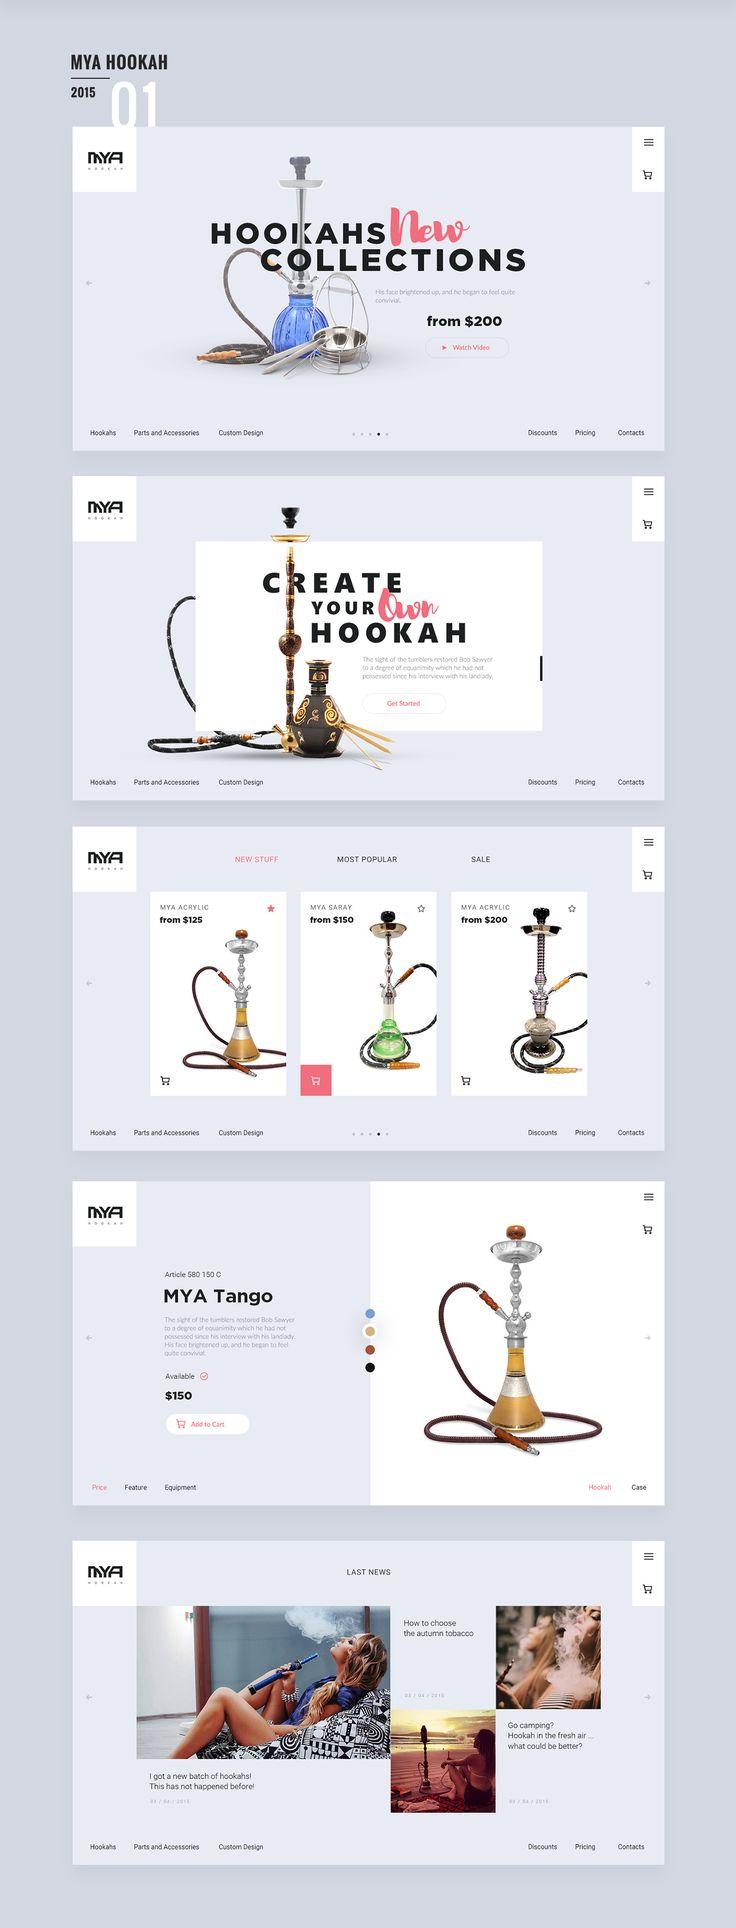 Mya Hookah by Valery Gurkov